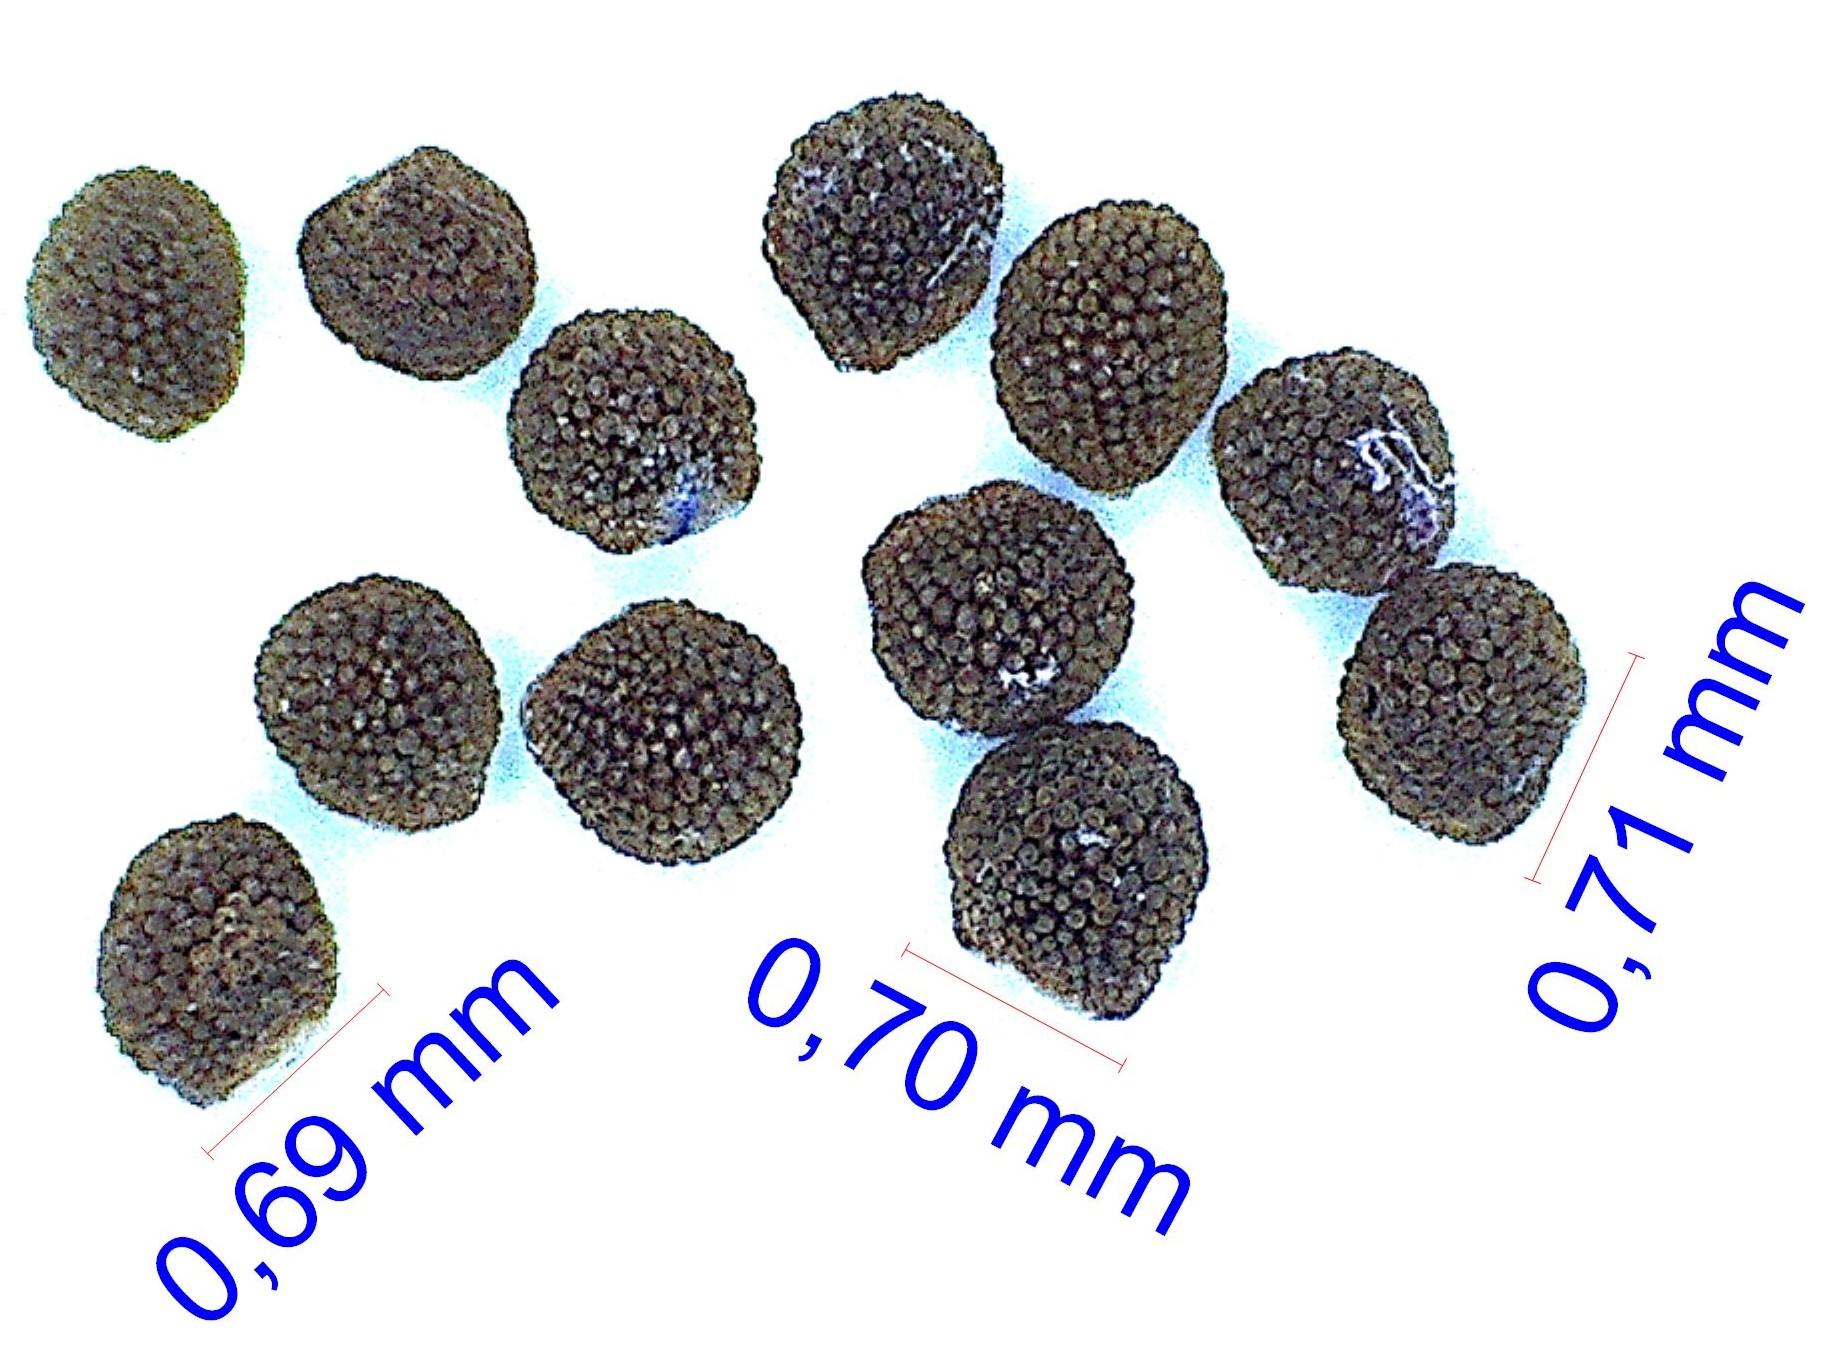 Gymnocalycium schreiteri L 439. © Joël Lodé/cactus-aventures.com